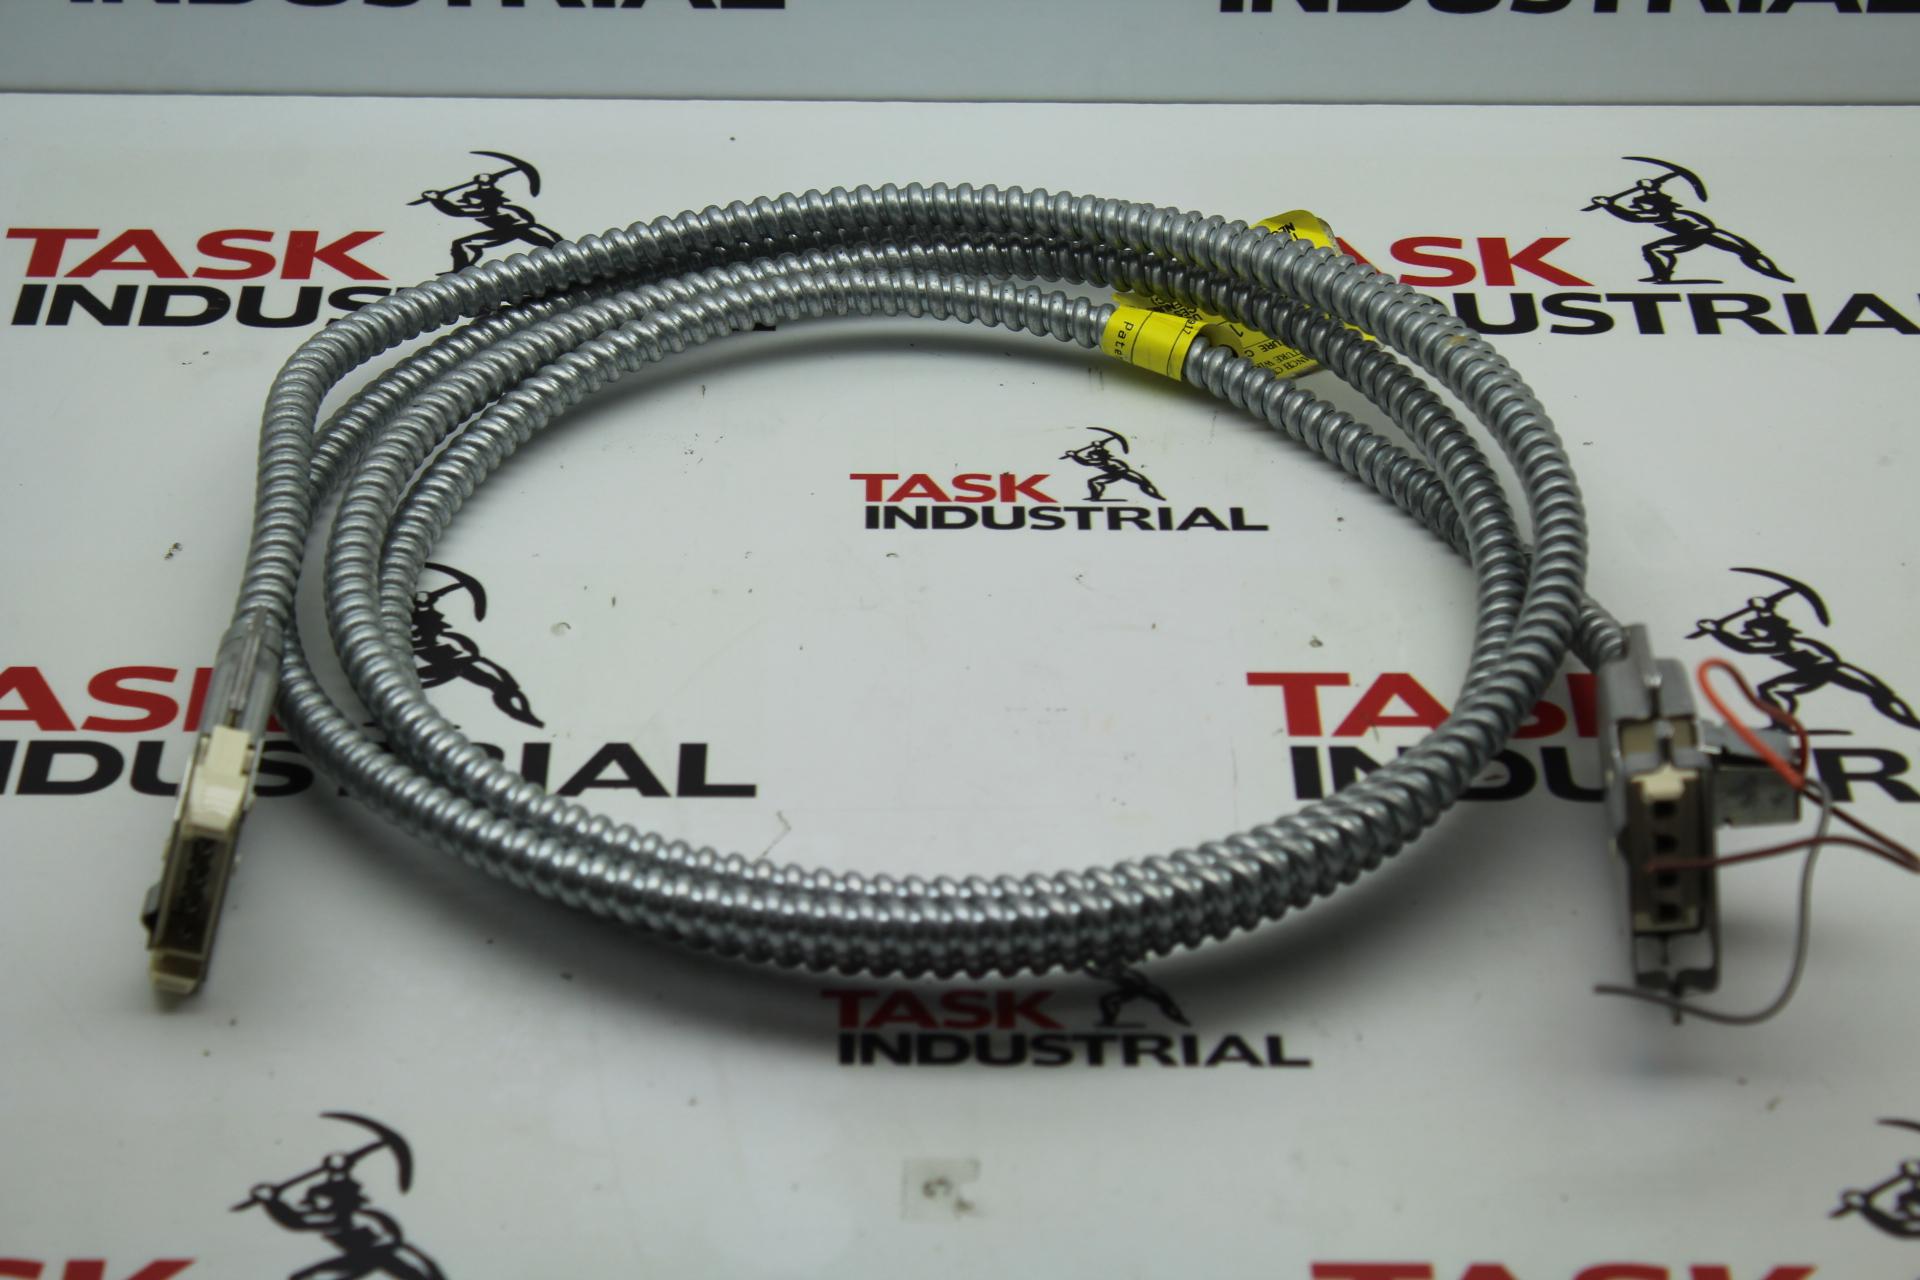 Lithonia QFC277 12/3G11 Quick-flex Fixture Cable